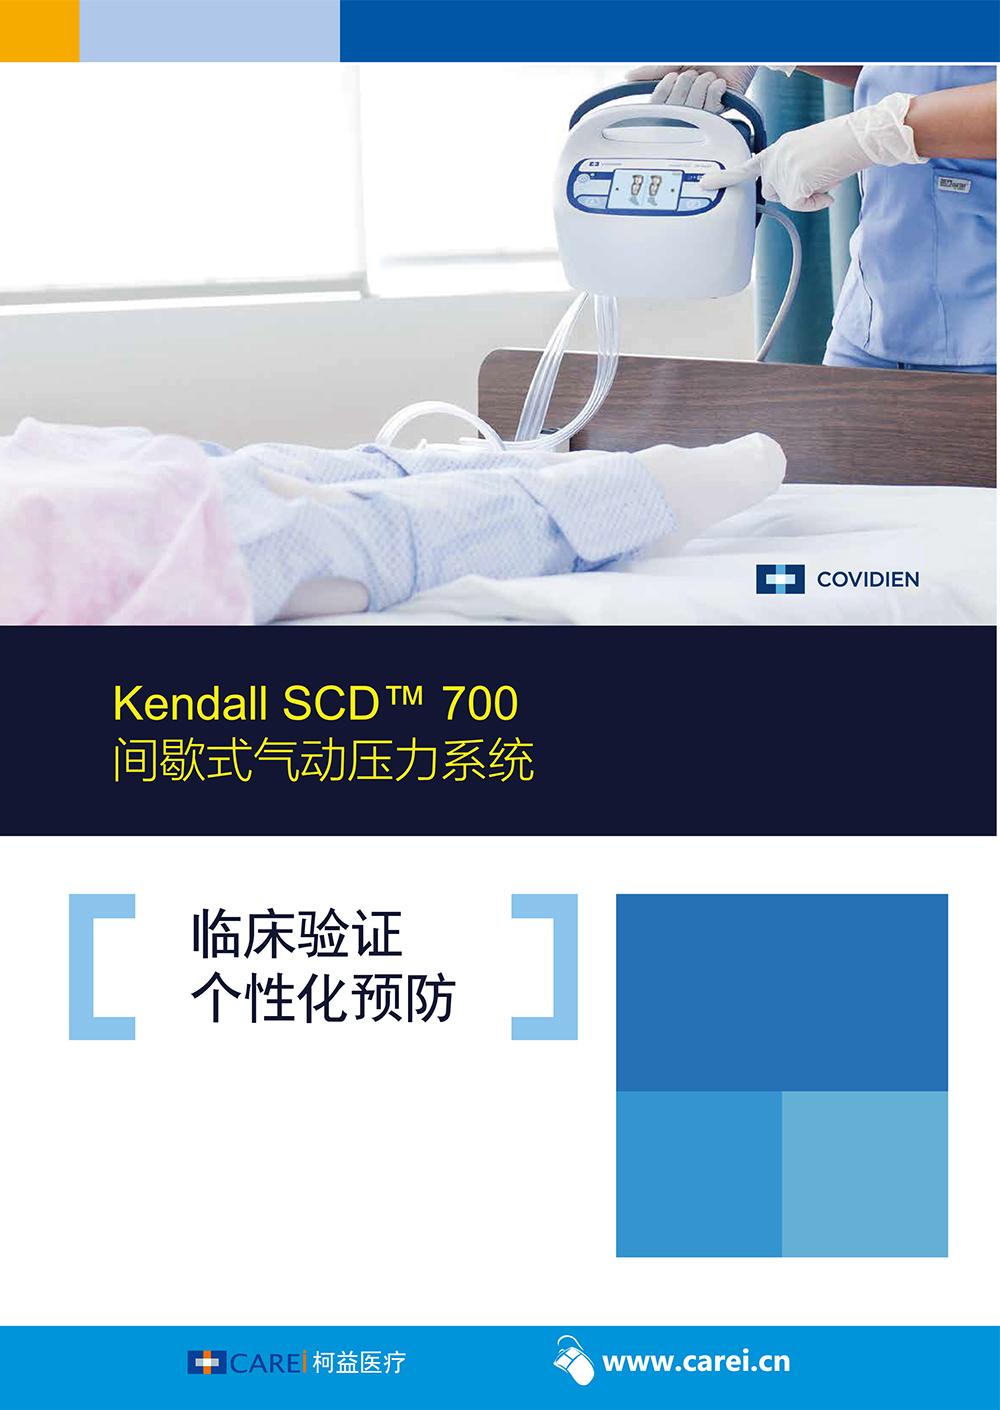 kendall-scd-700-series-controller-f1.jpg